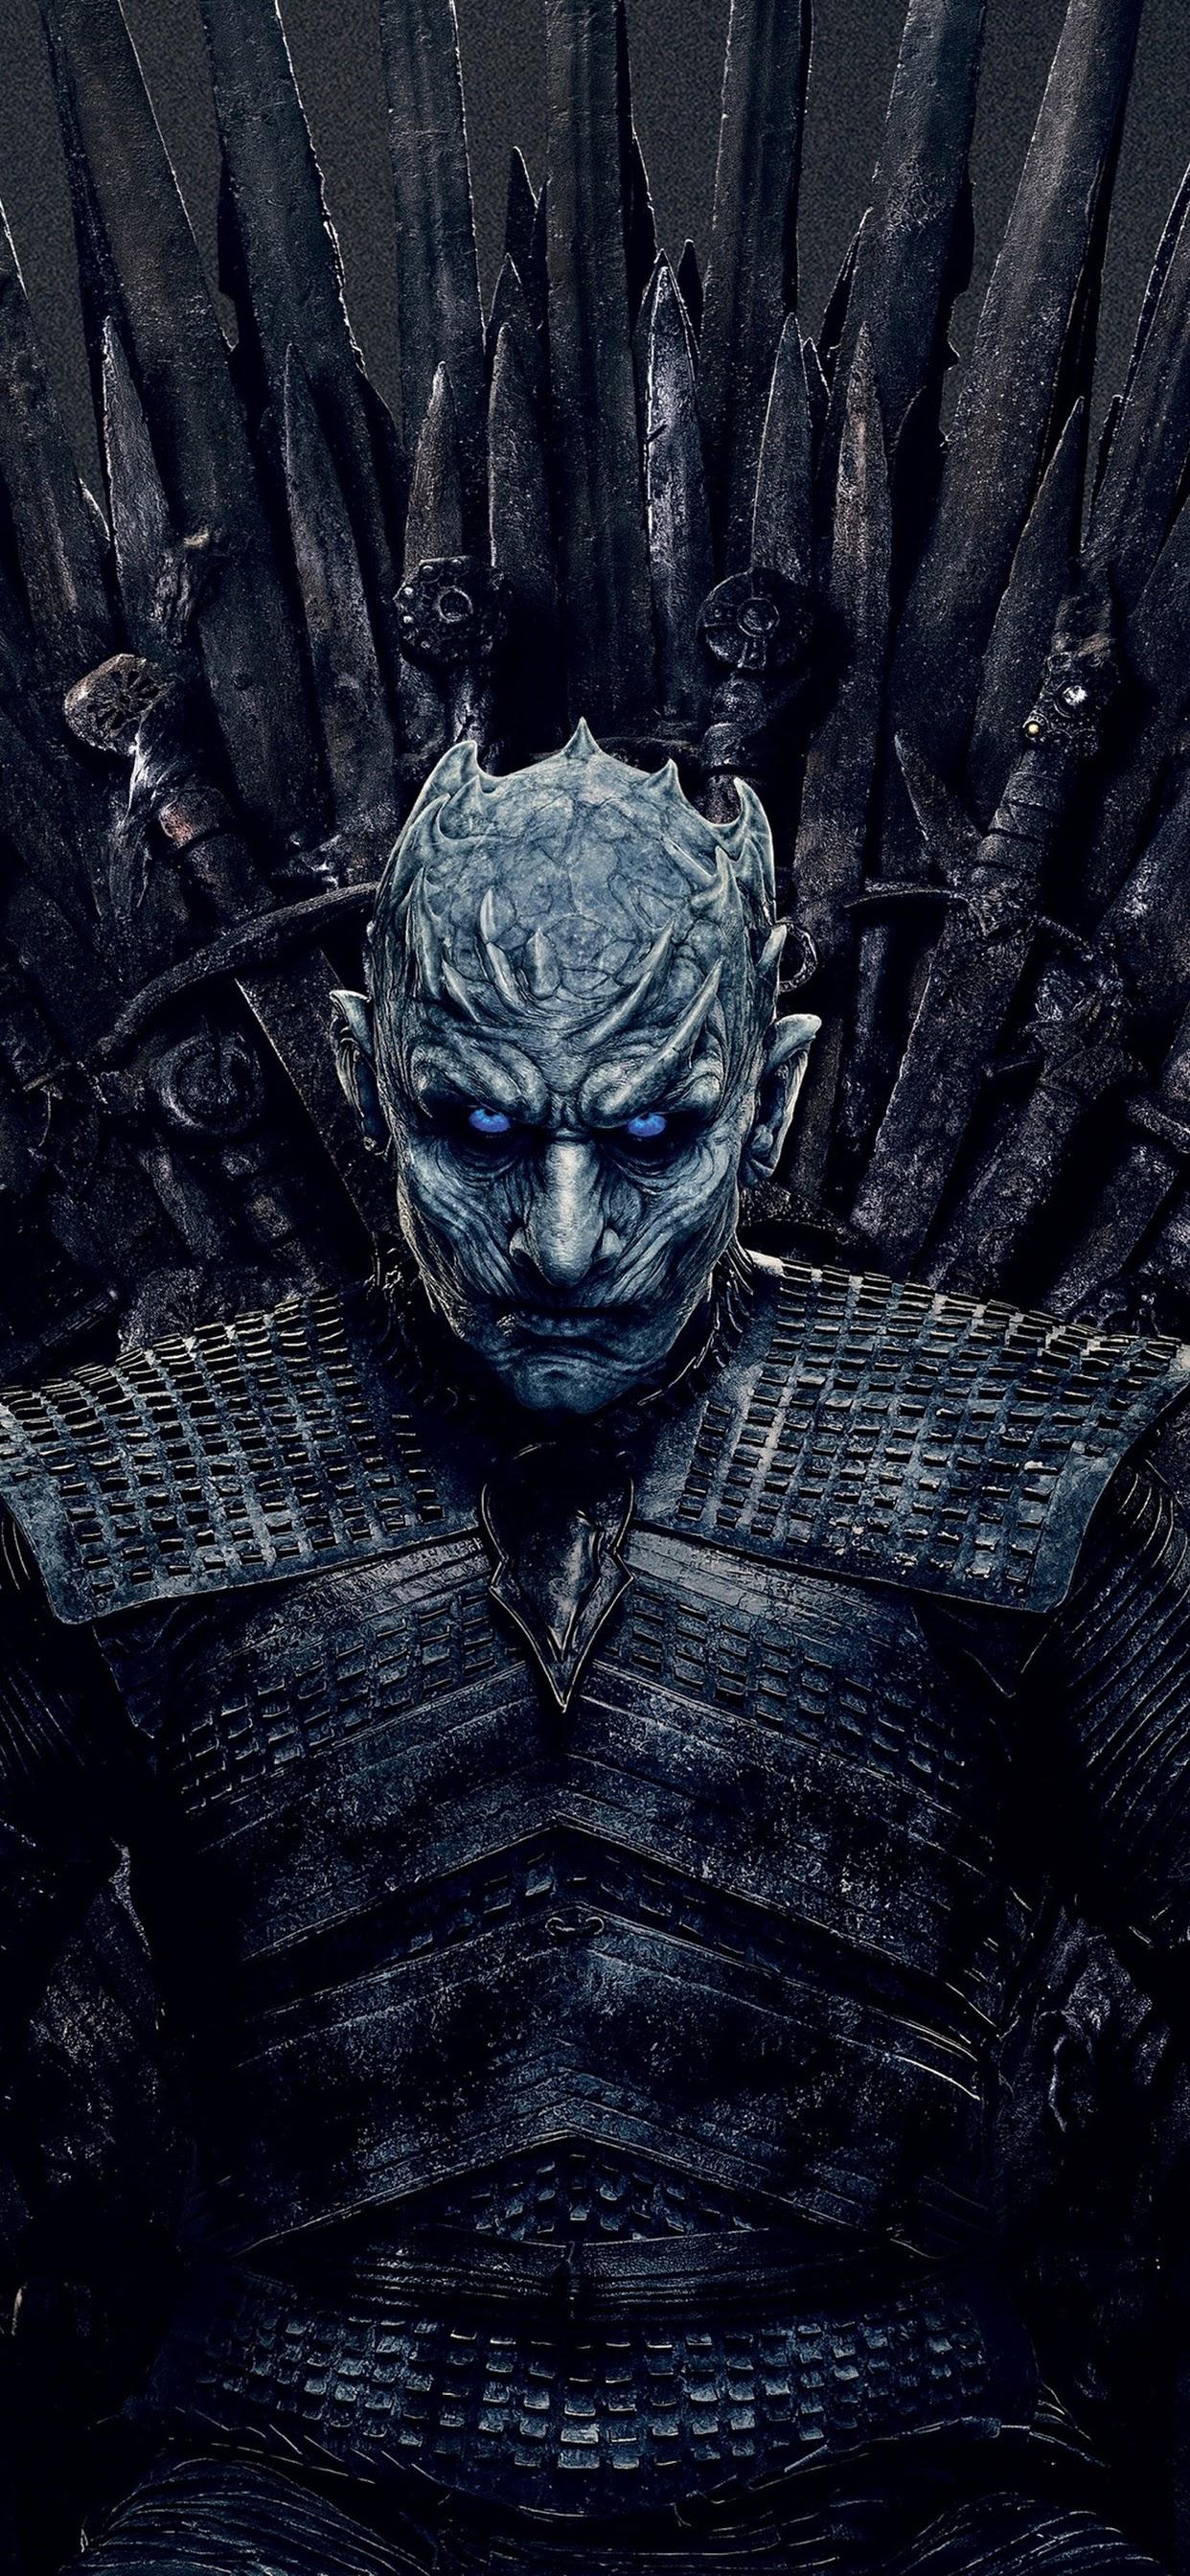 Night King, Game Of Thrones, Season 8, 4k, - Game Of Thrones - HD Wallpaper